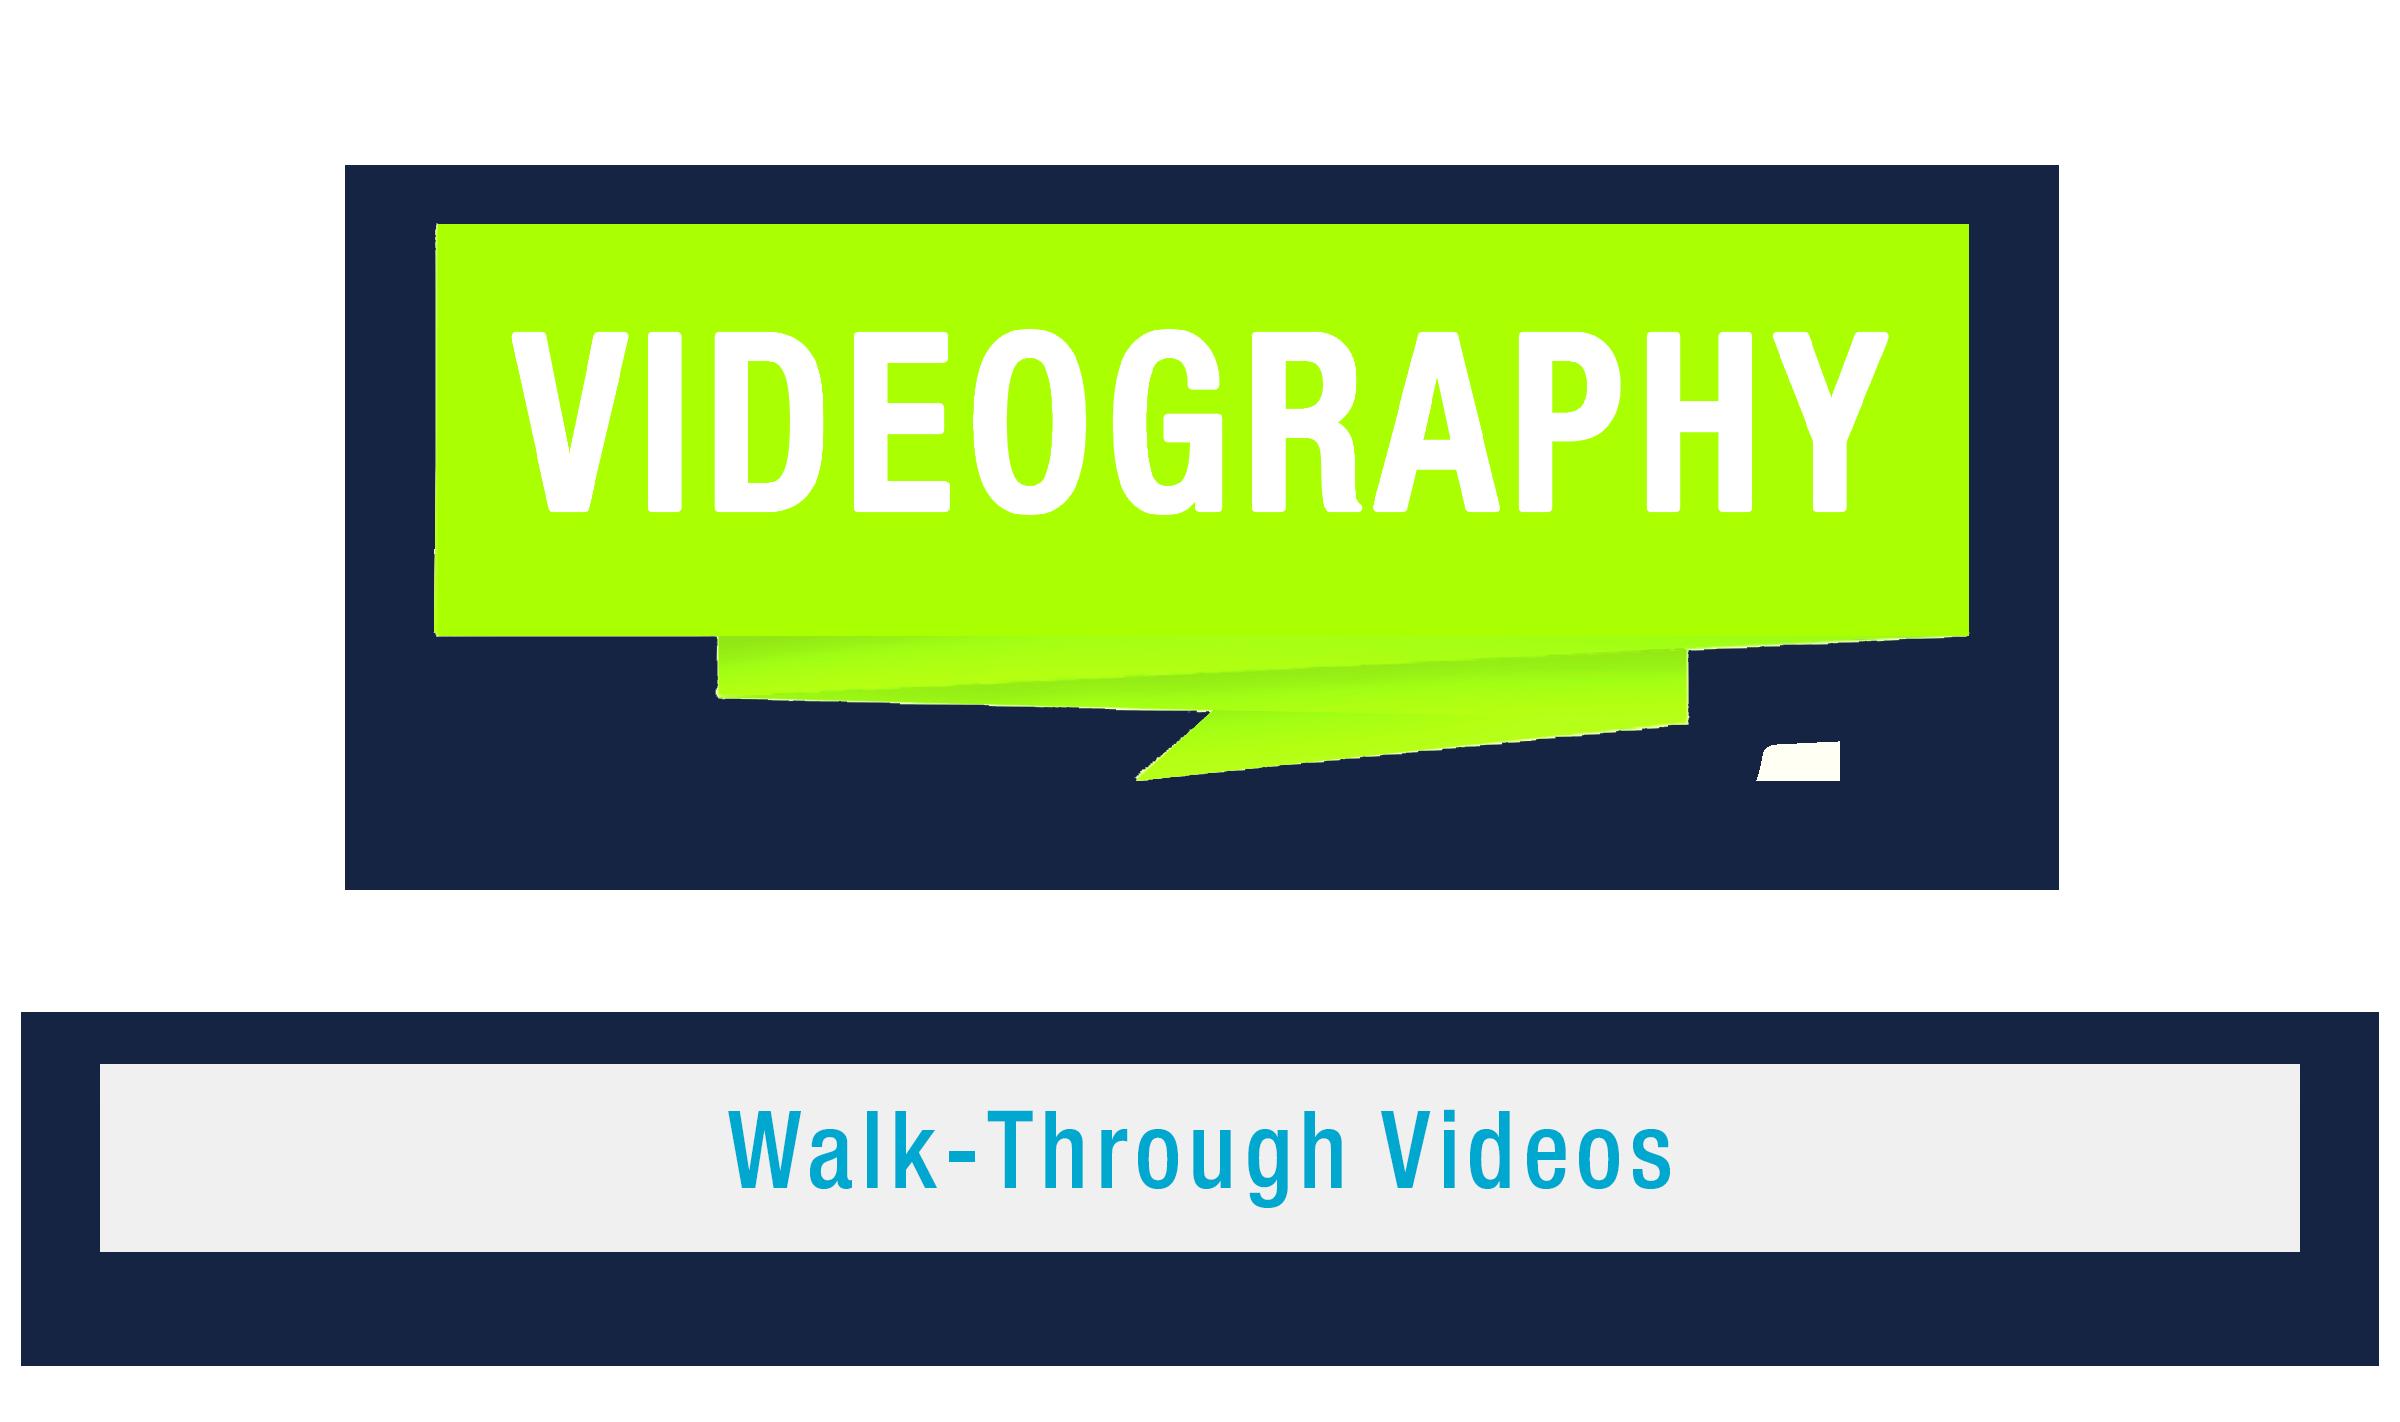 LP - Digital Media - Videography1.png